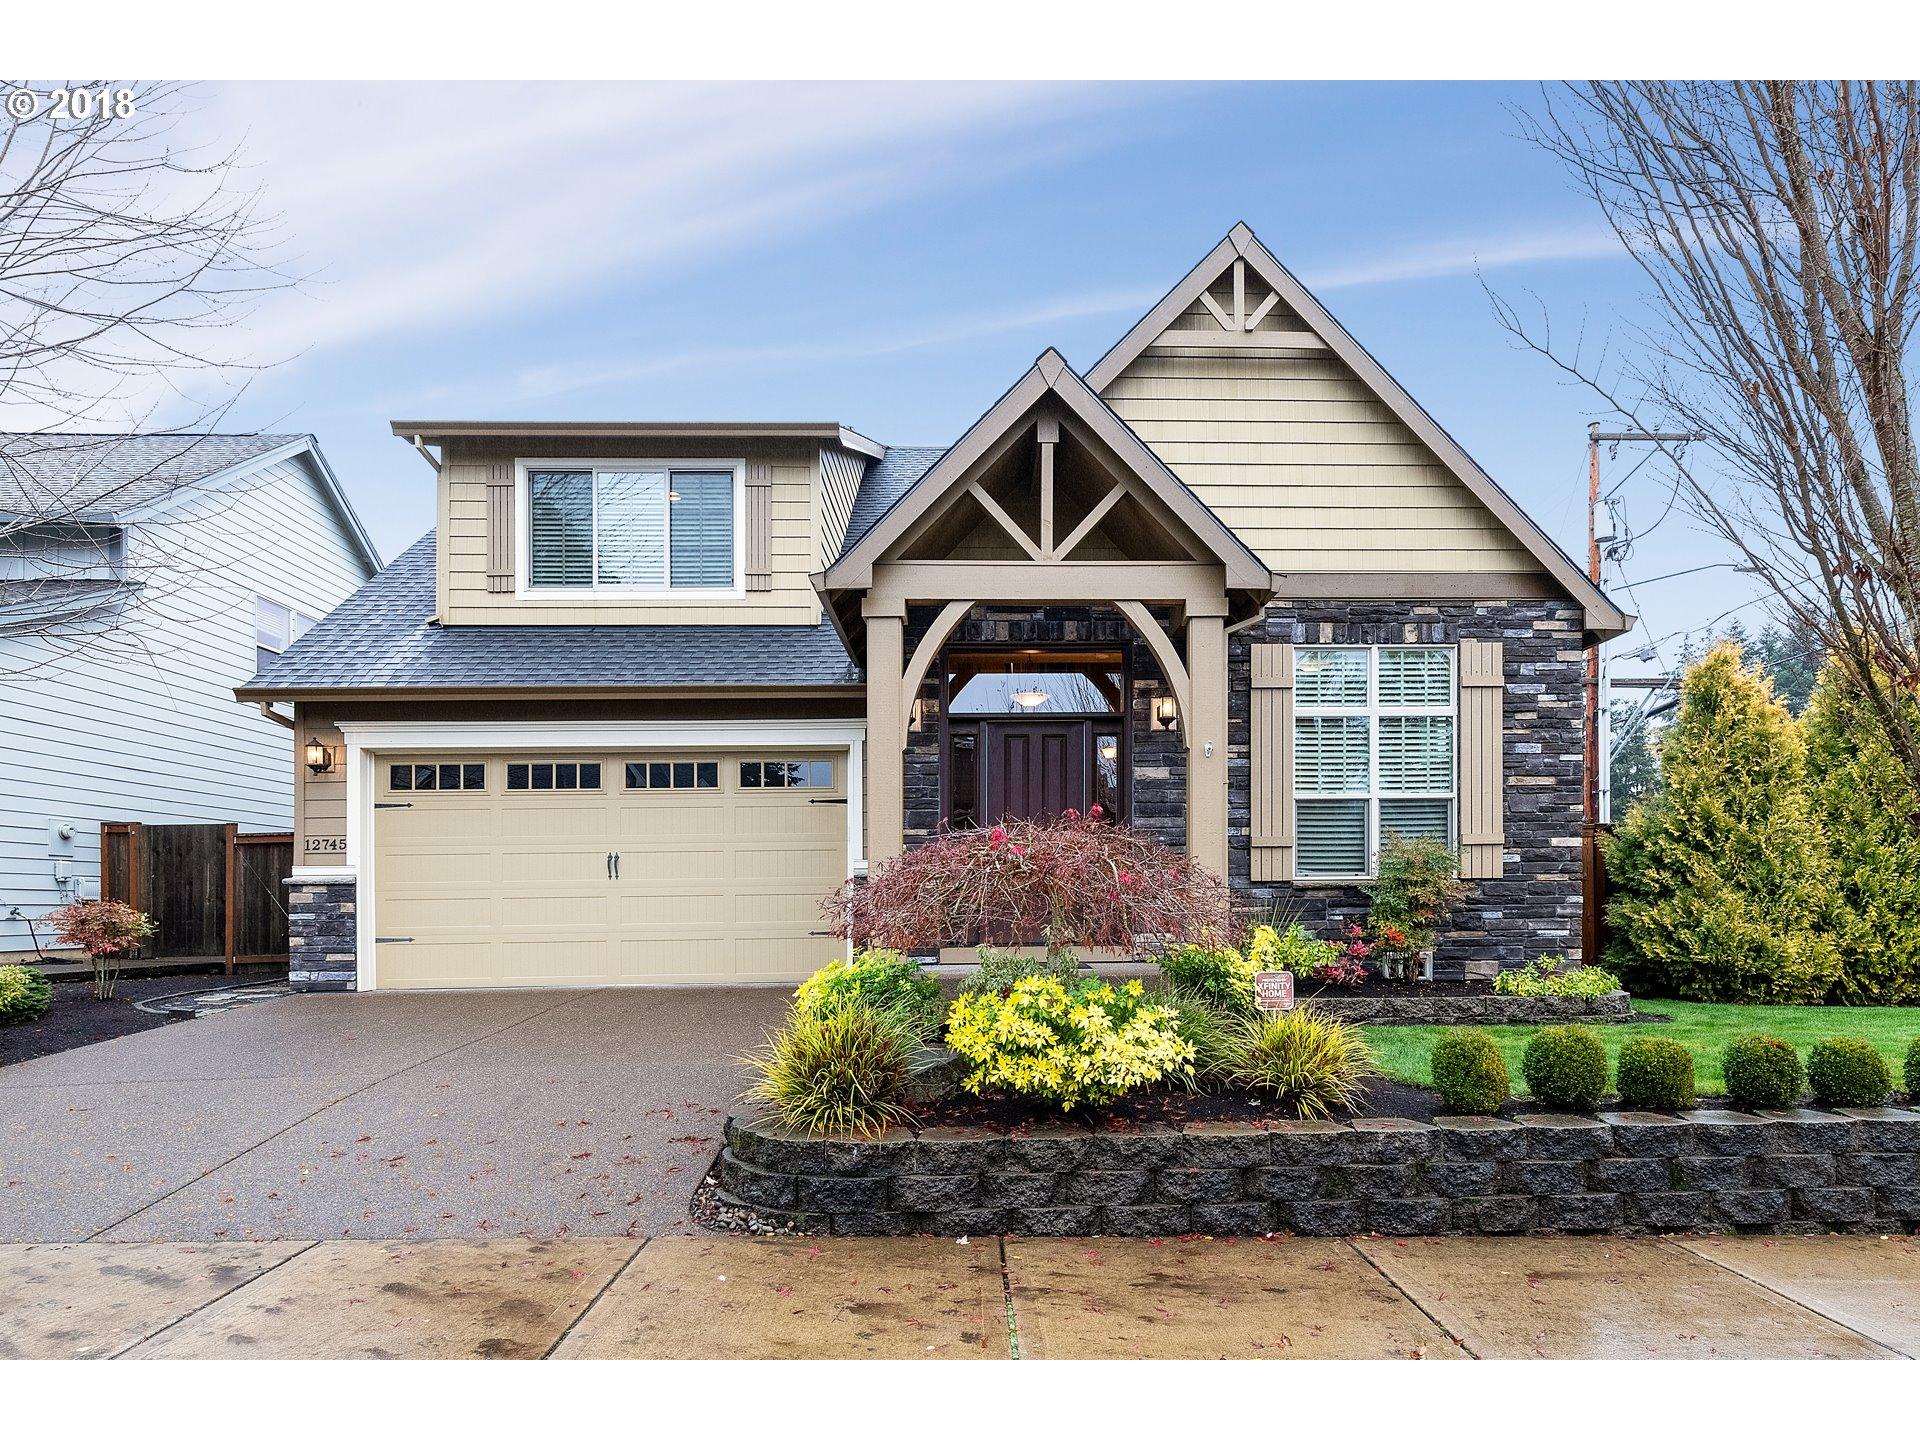 12745 SWALLOWTAIL PL, Oregon City OR 97045